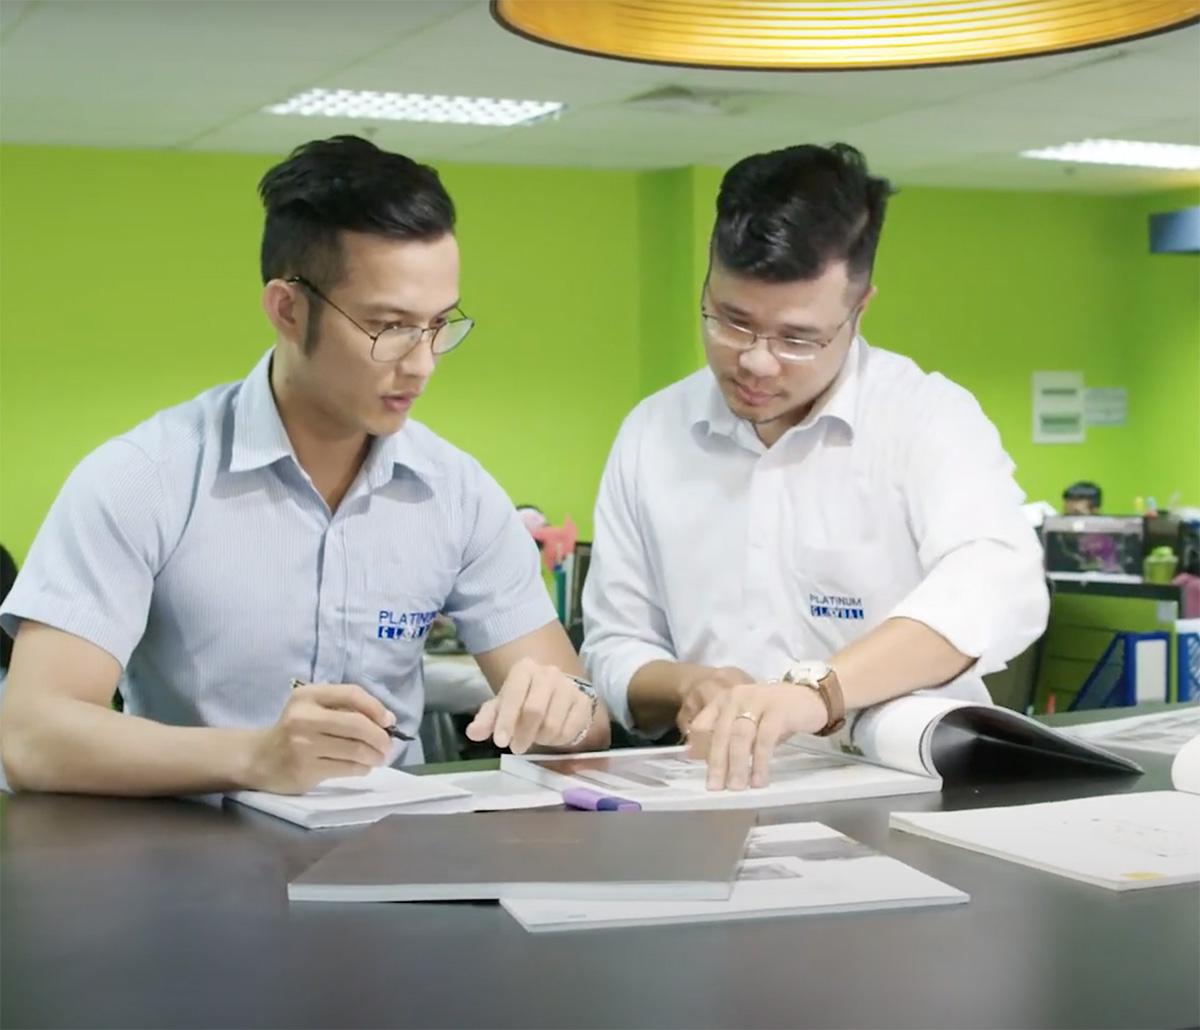 MiTek Execution Management Services - Two men at standing desk working on estimating